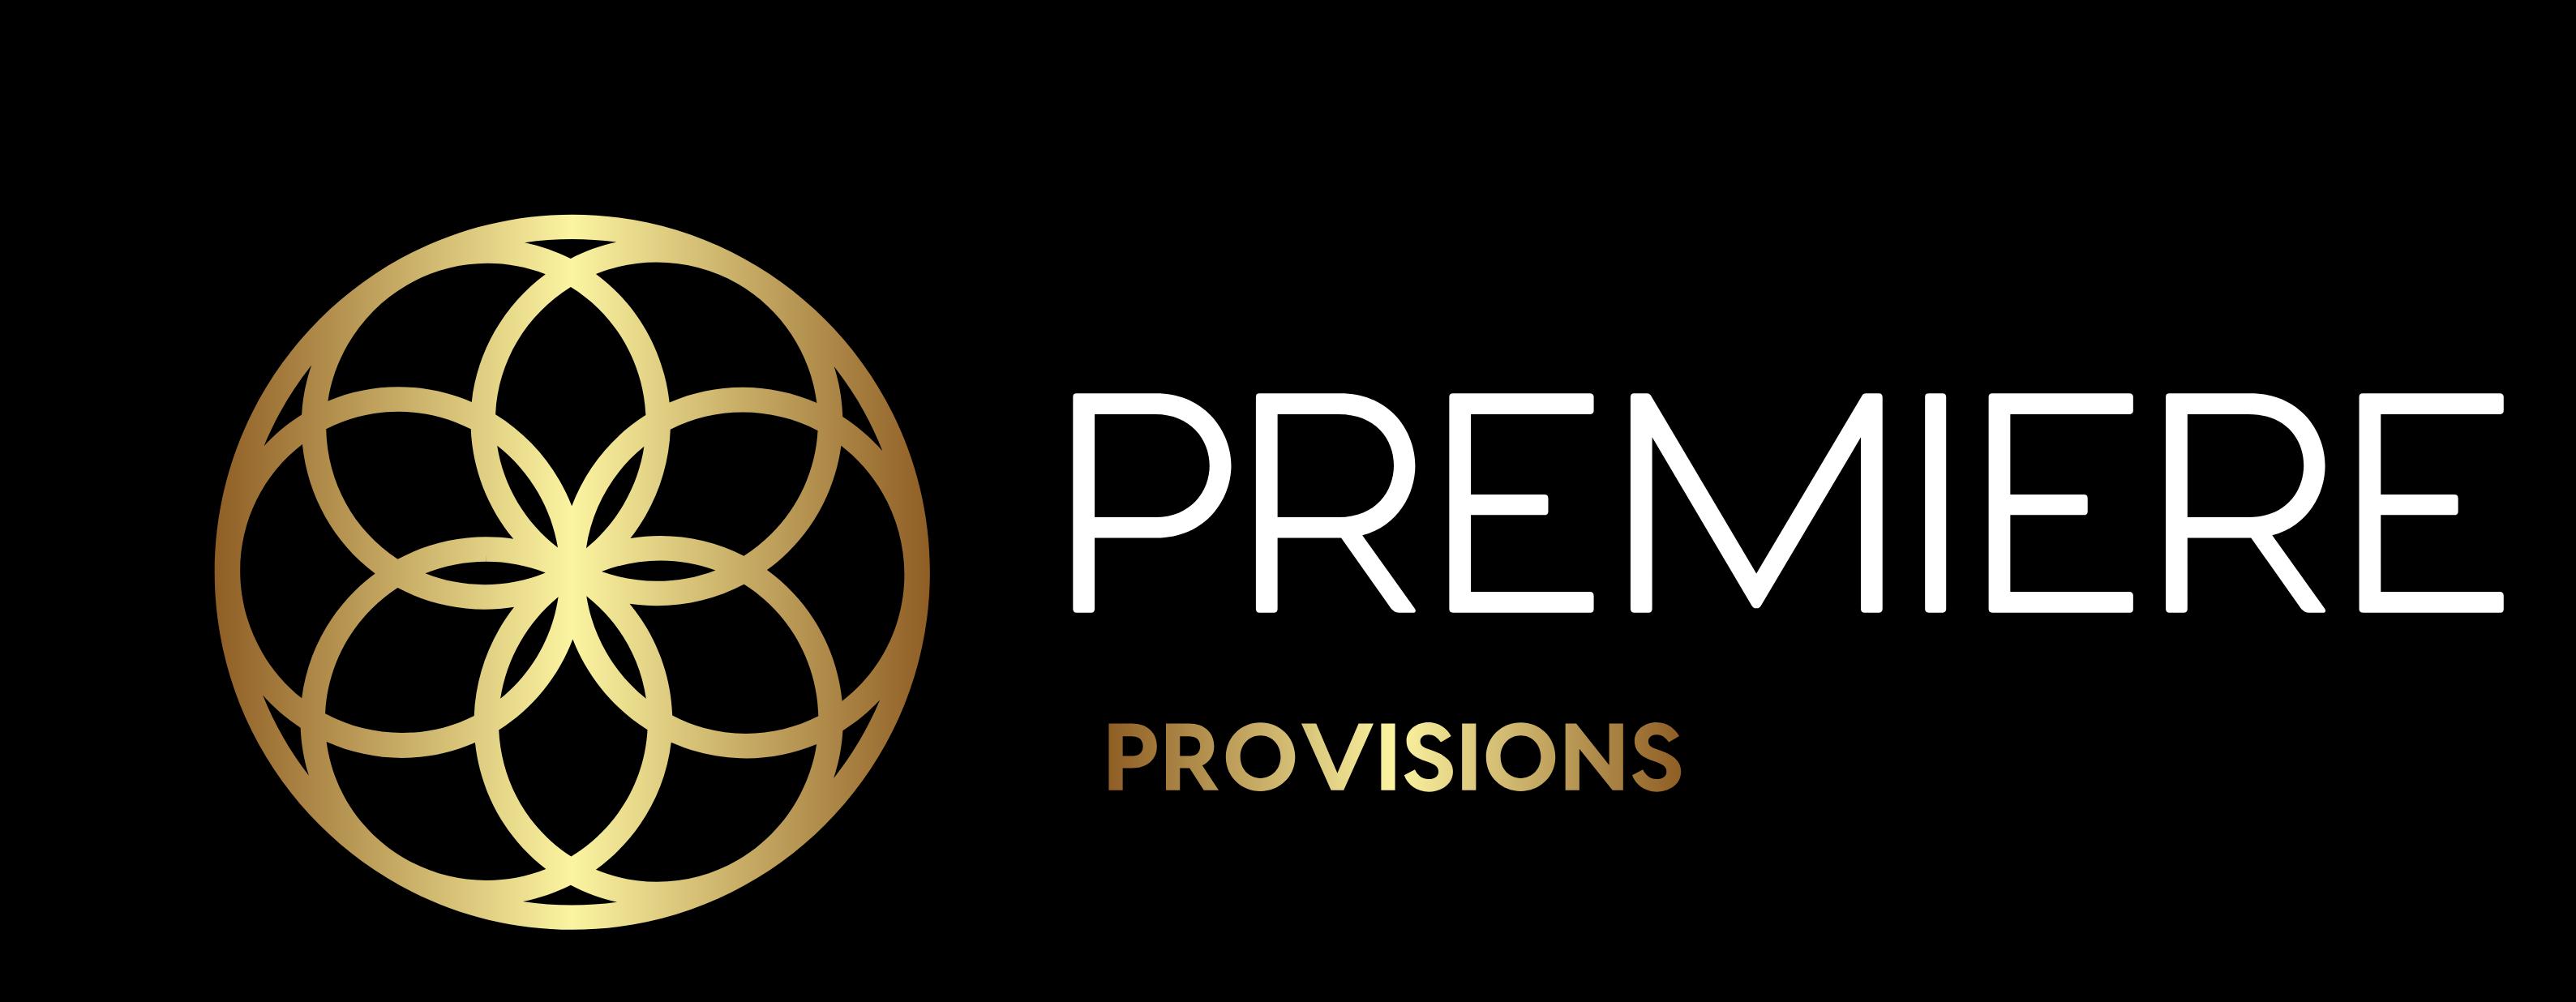 Premiere Provisions Big Rapids Marijuana Store